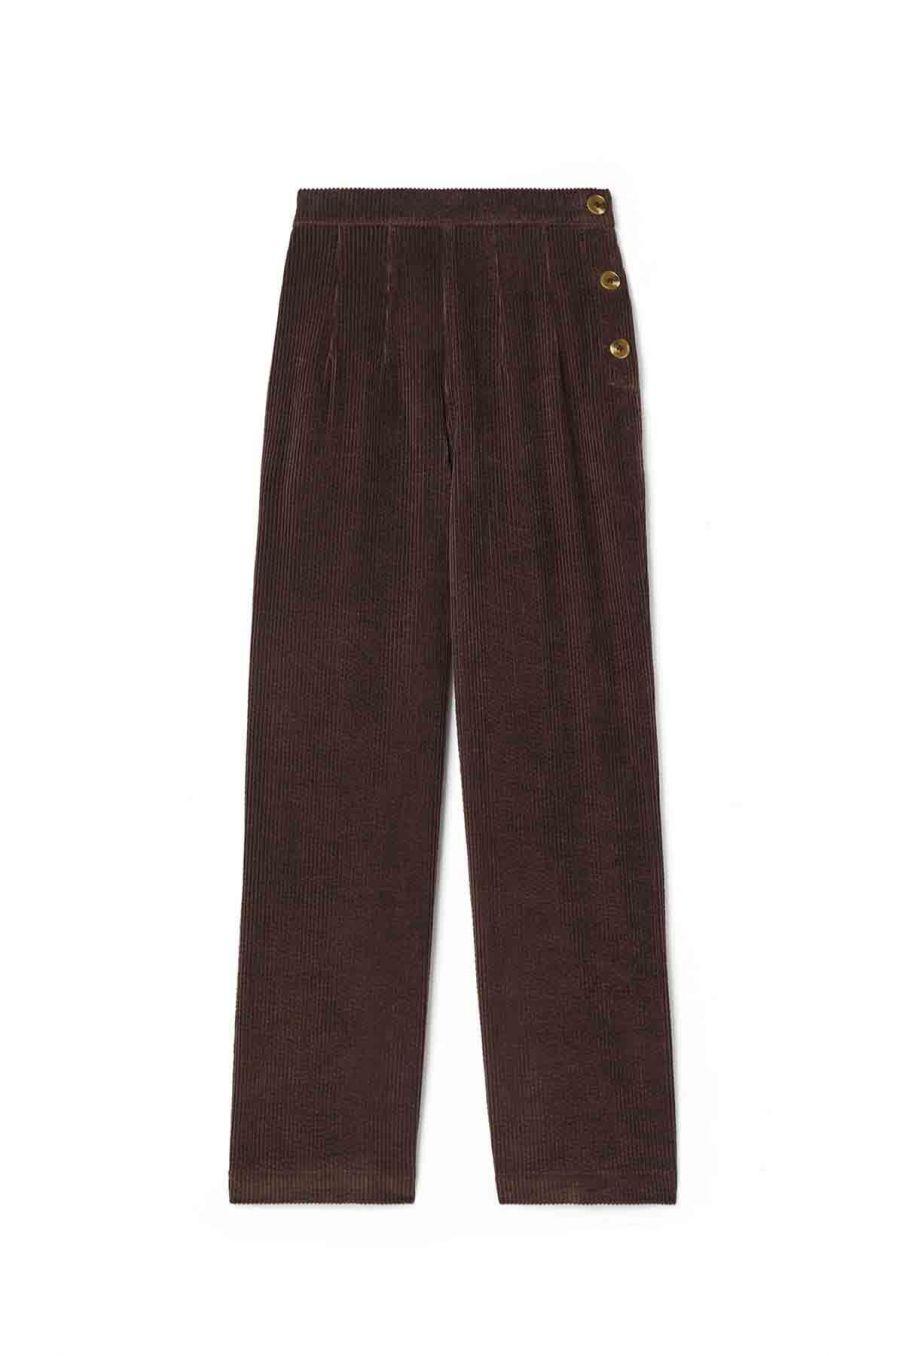 pantalon femme beatriz grape - louise misha